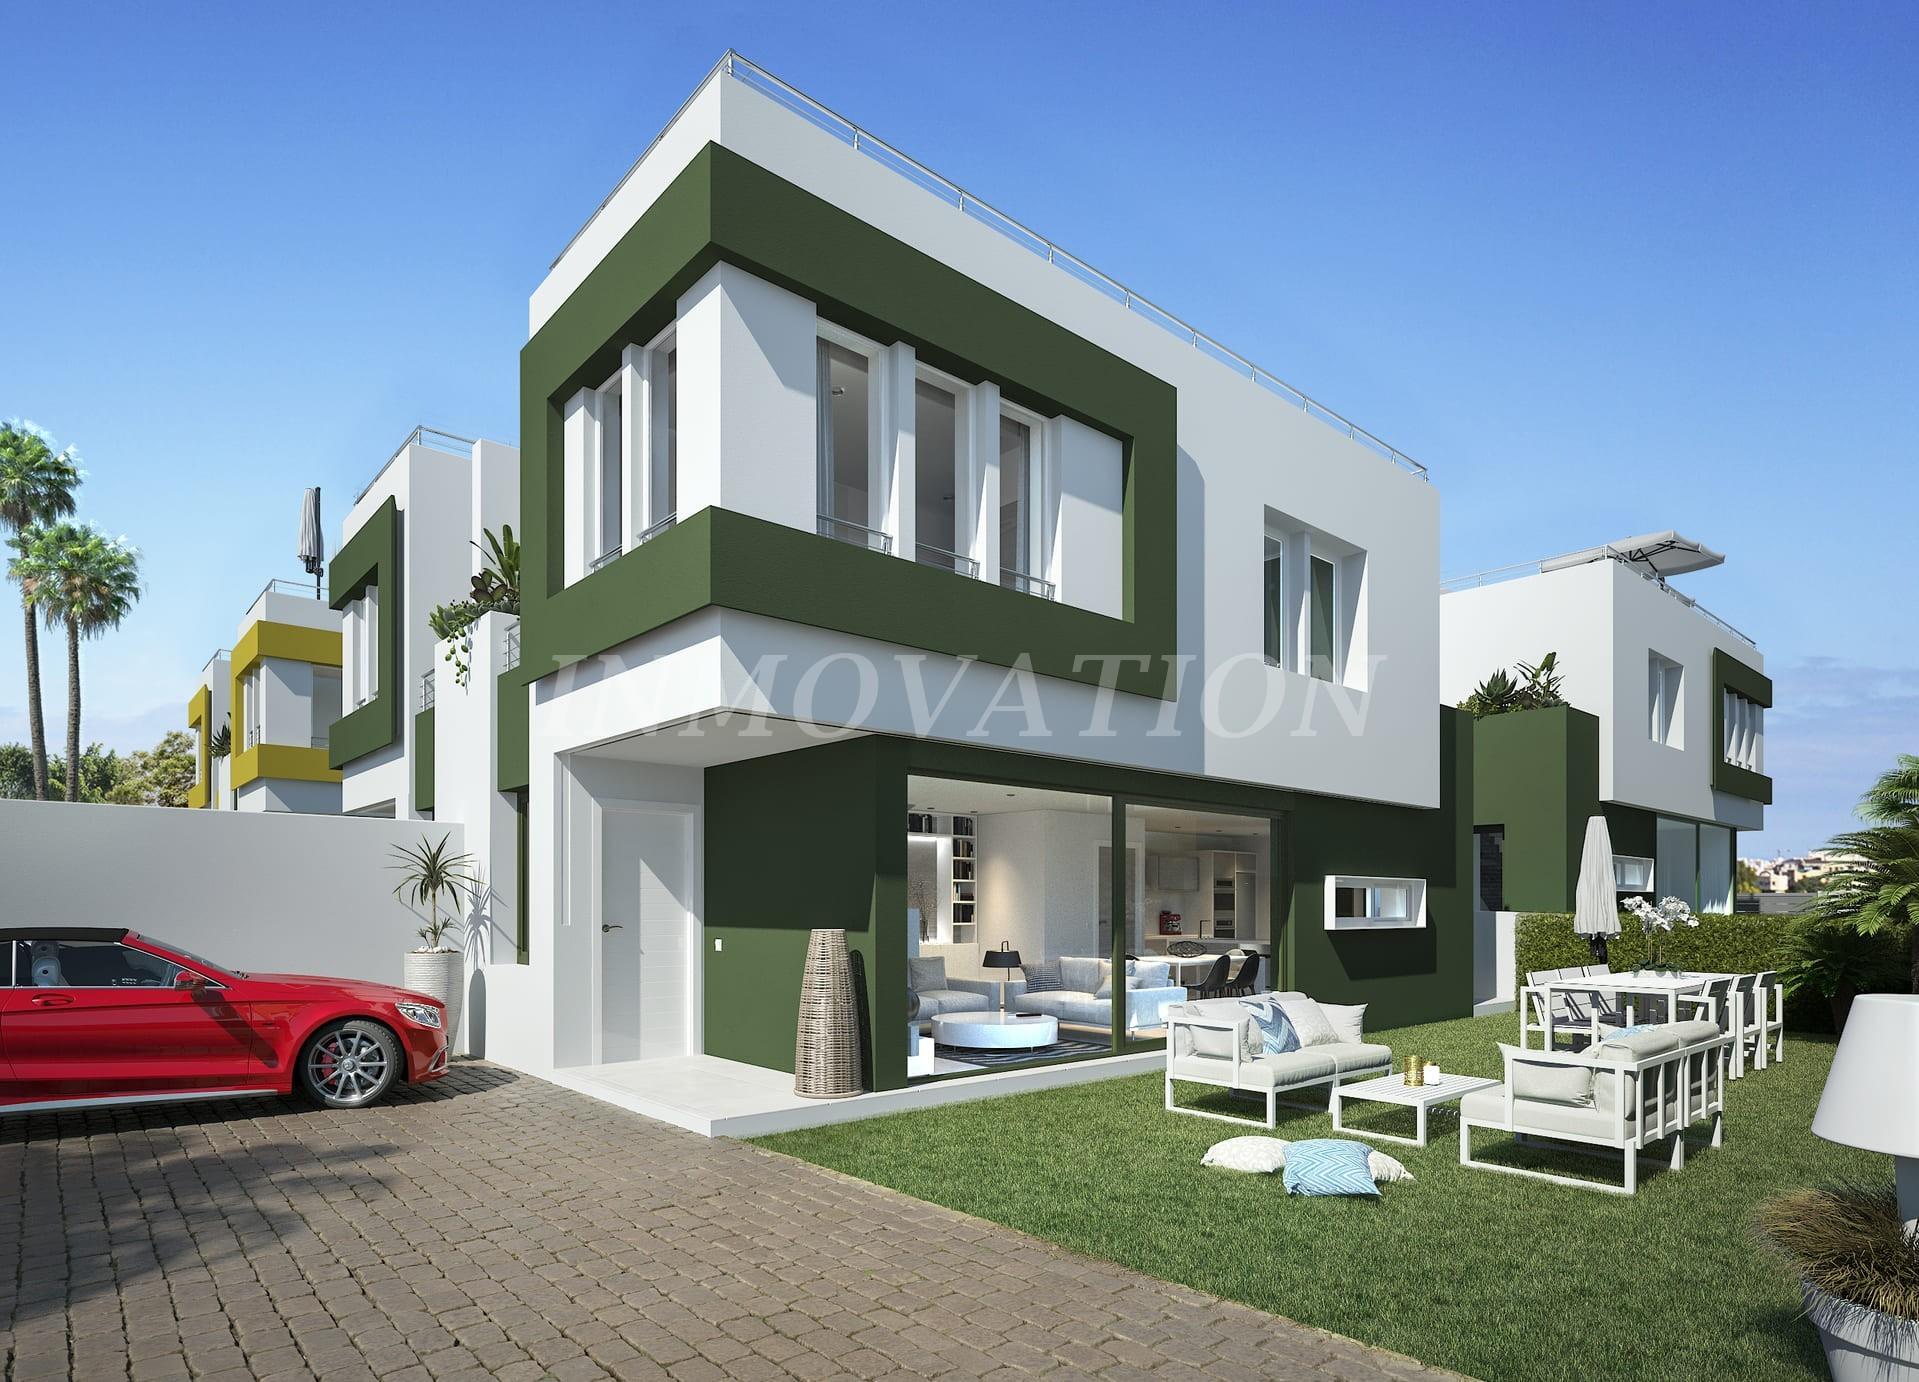 Modern Design Semi-Detached Villas in Denia